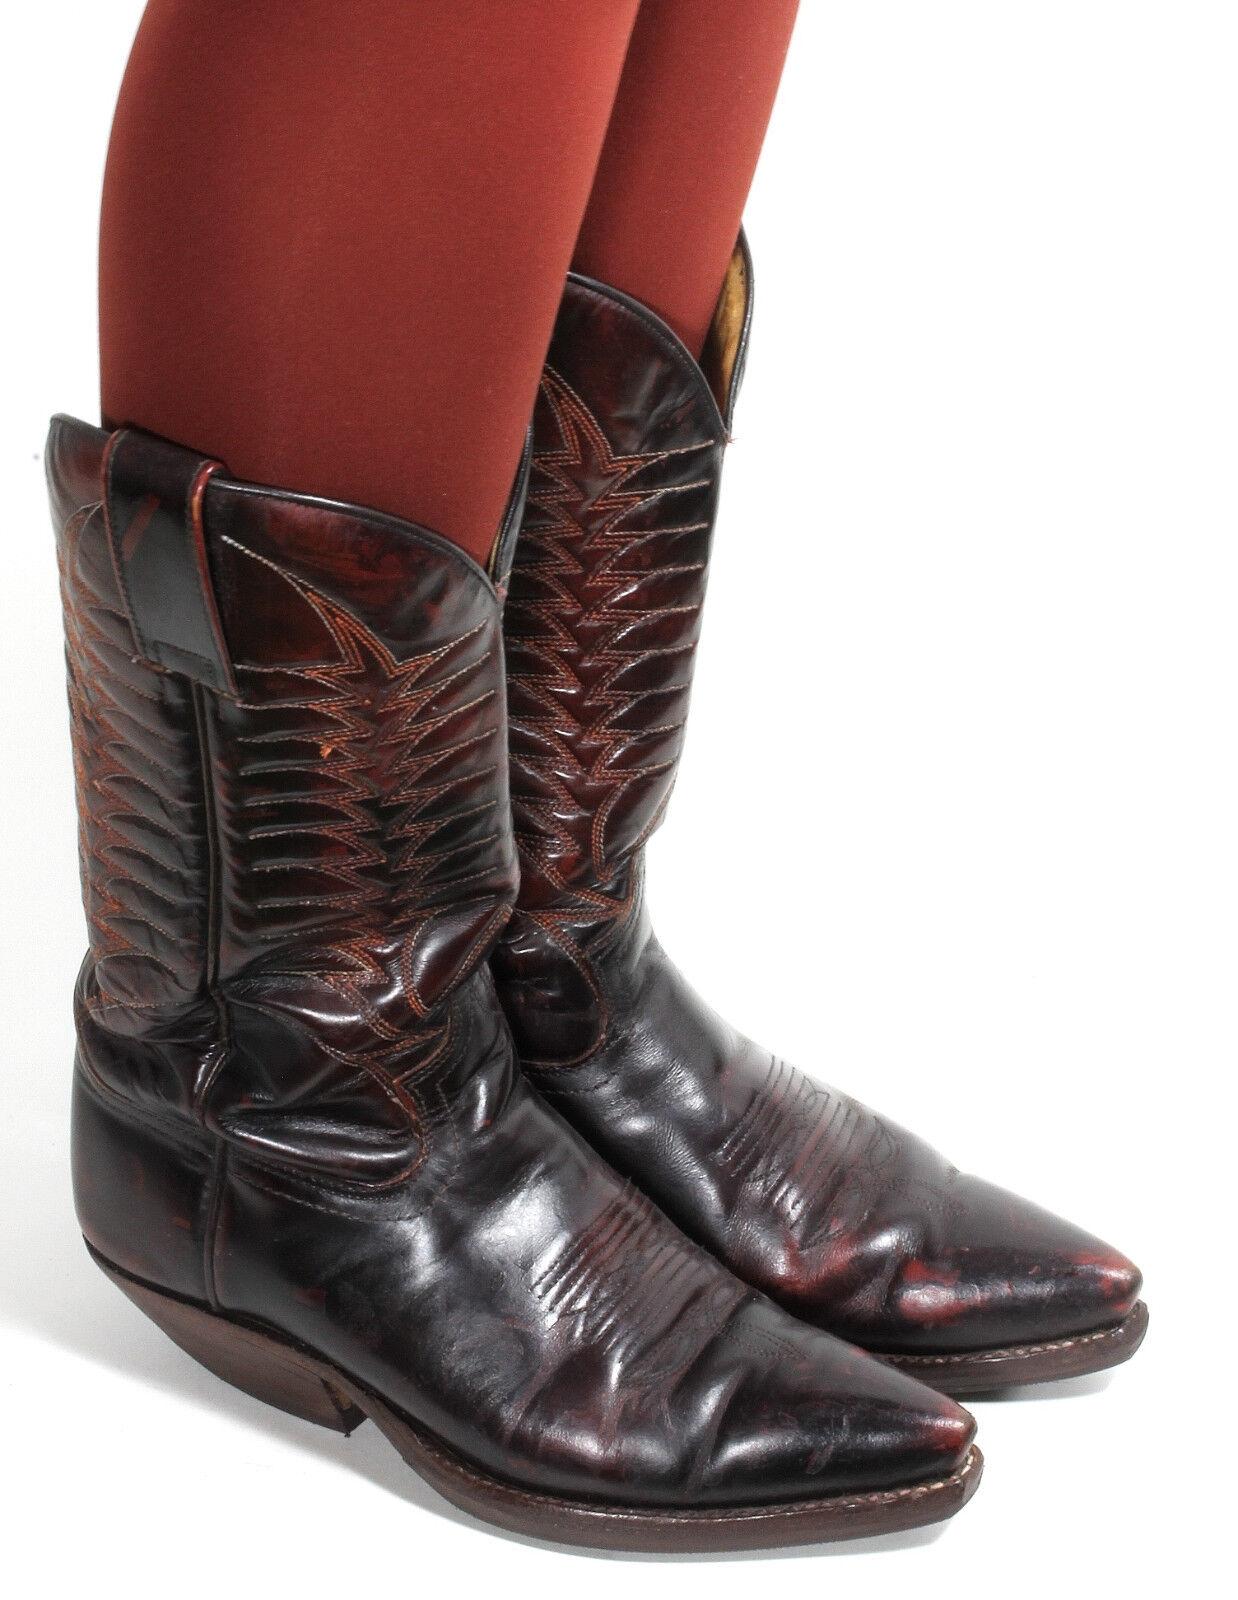 Westernstiefel Cowboystiefel Catalan Style Line Dance Texas Mosquito Stiefel 37